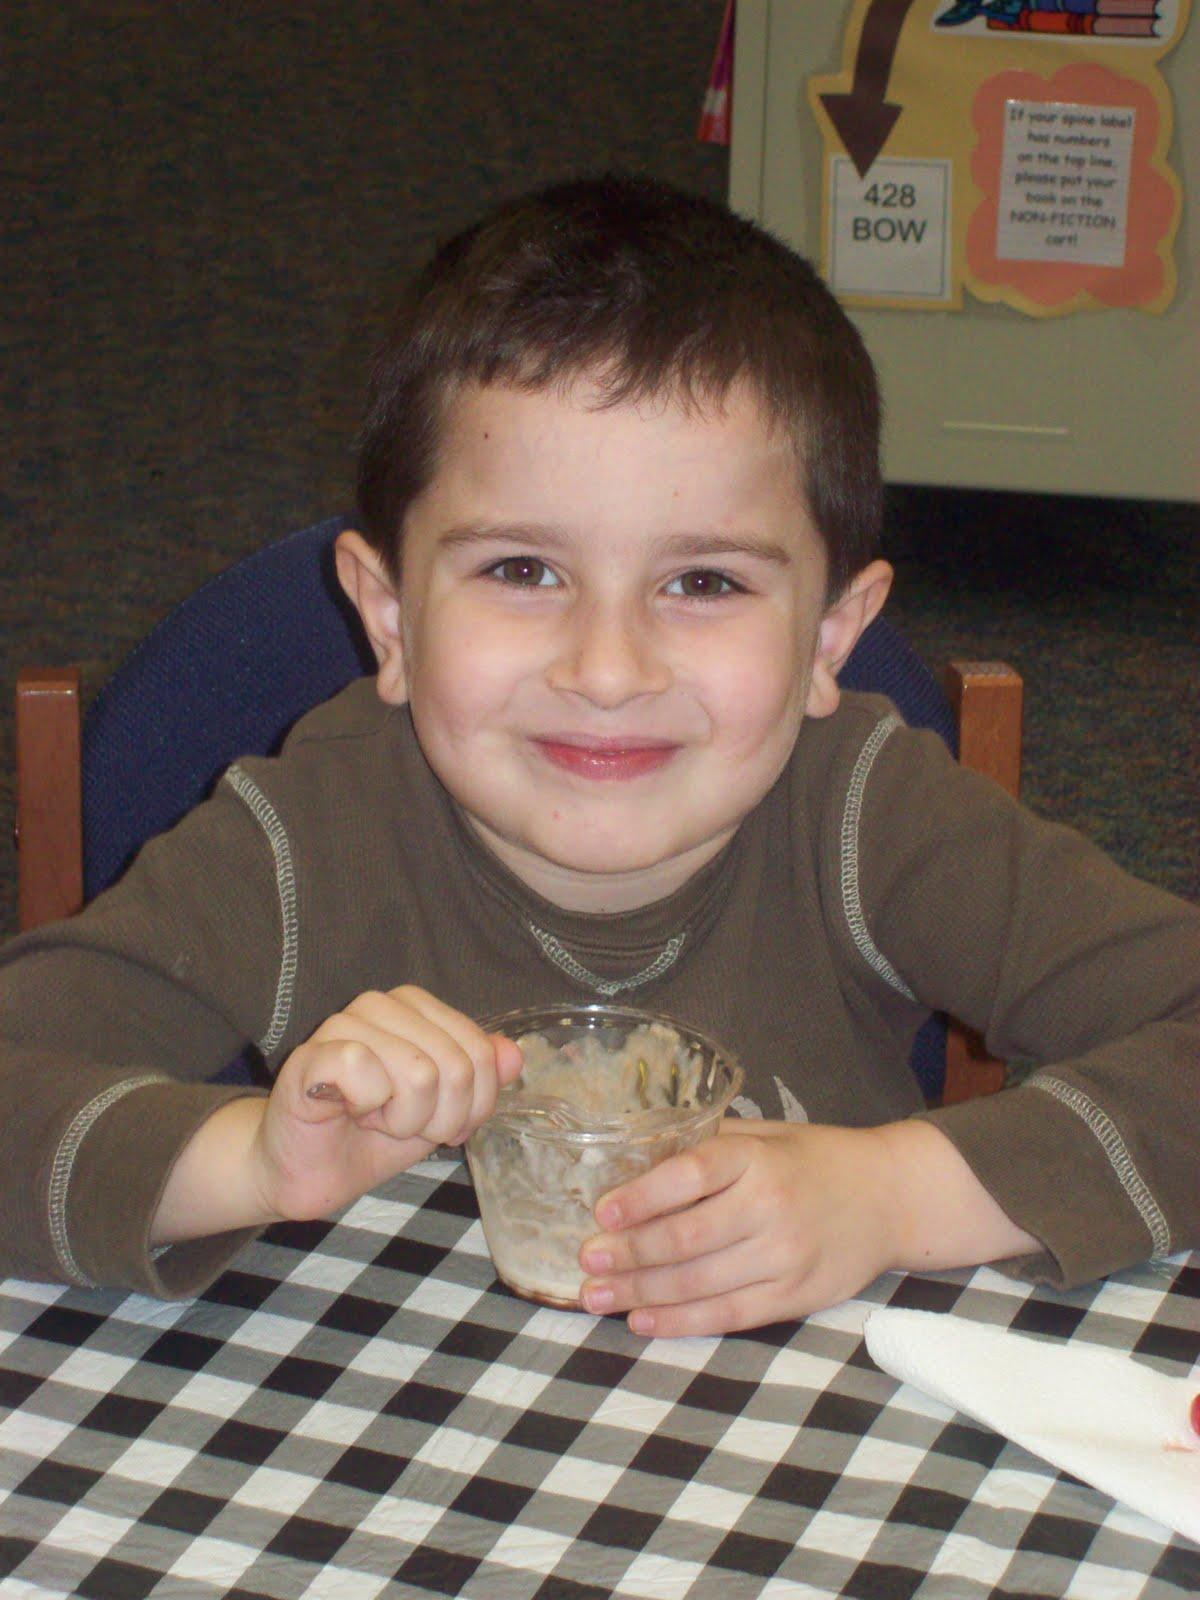 Kinder Garden: Kindergarten Chronicles: A Kindergarten Blog...: Going